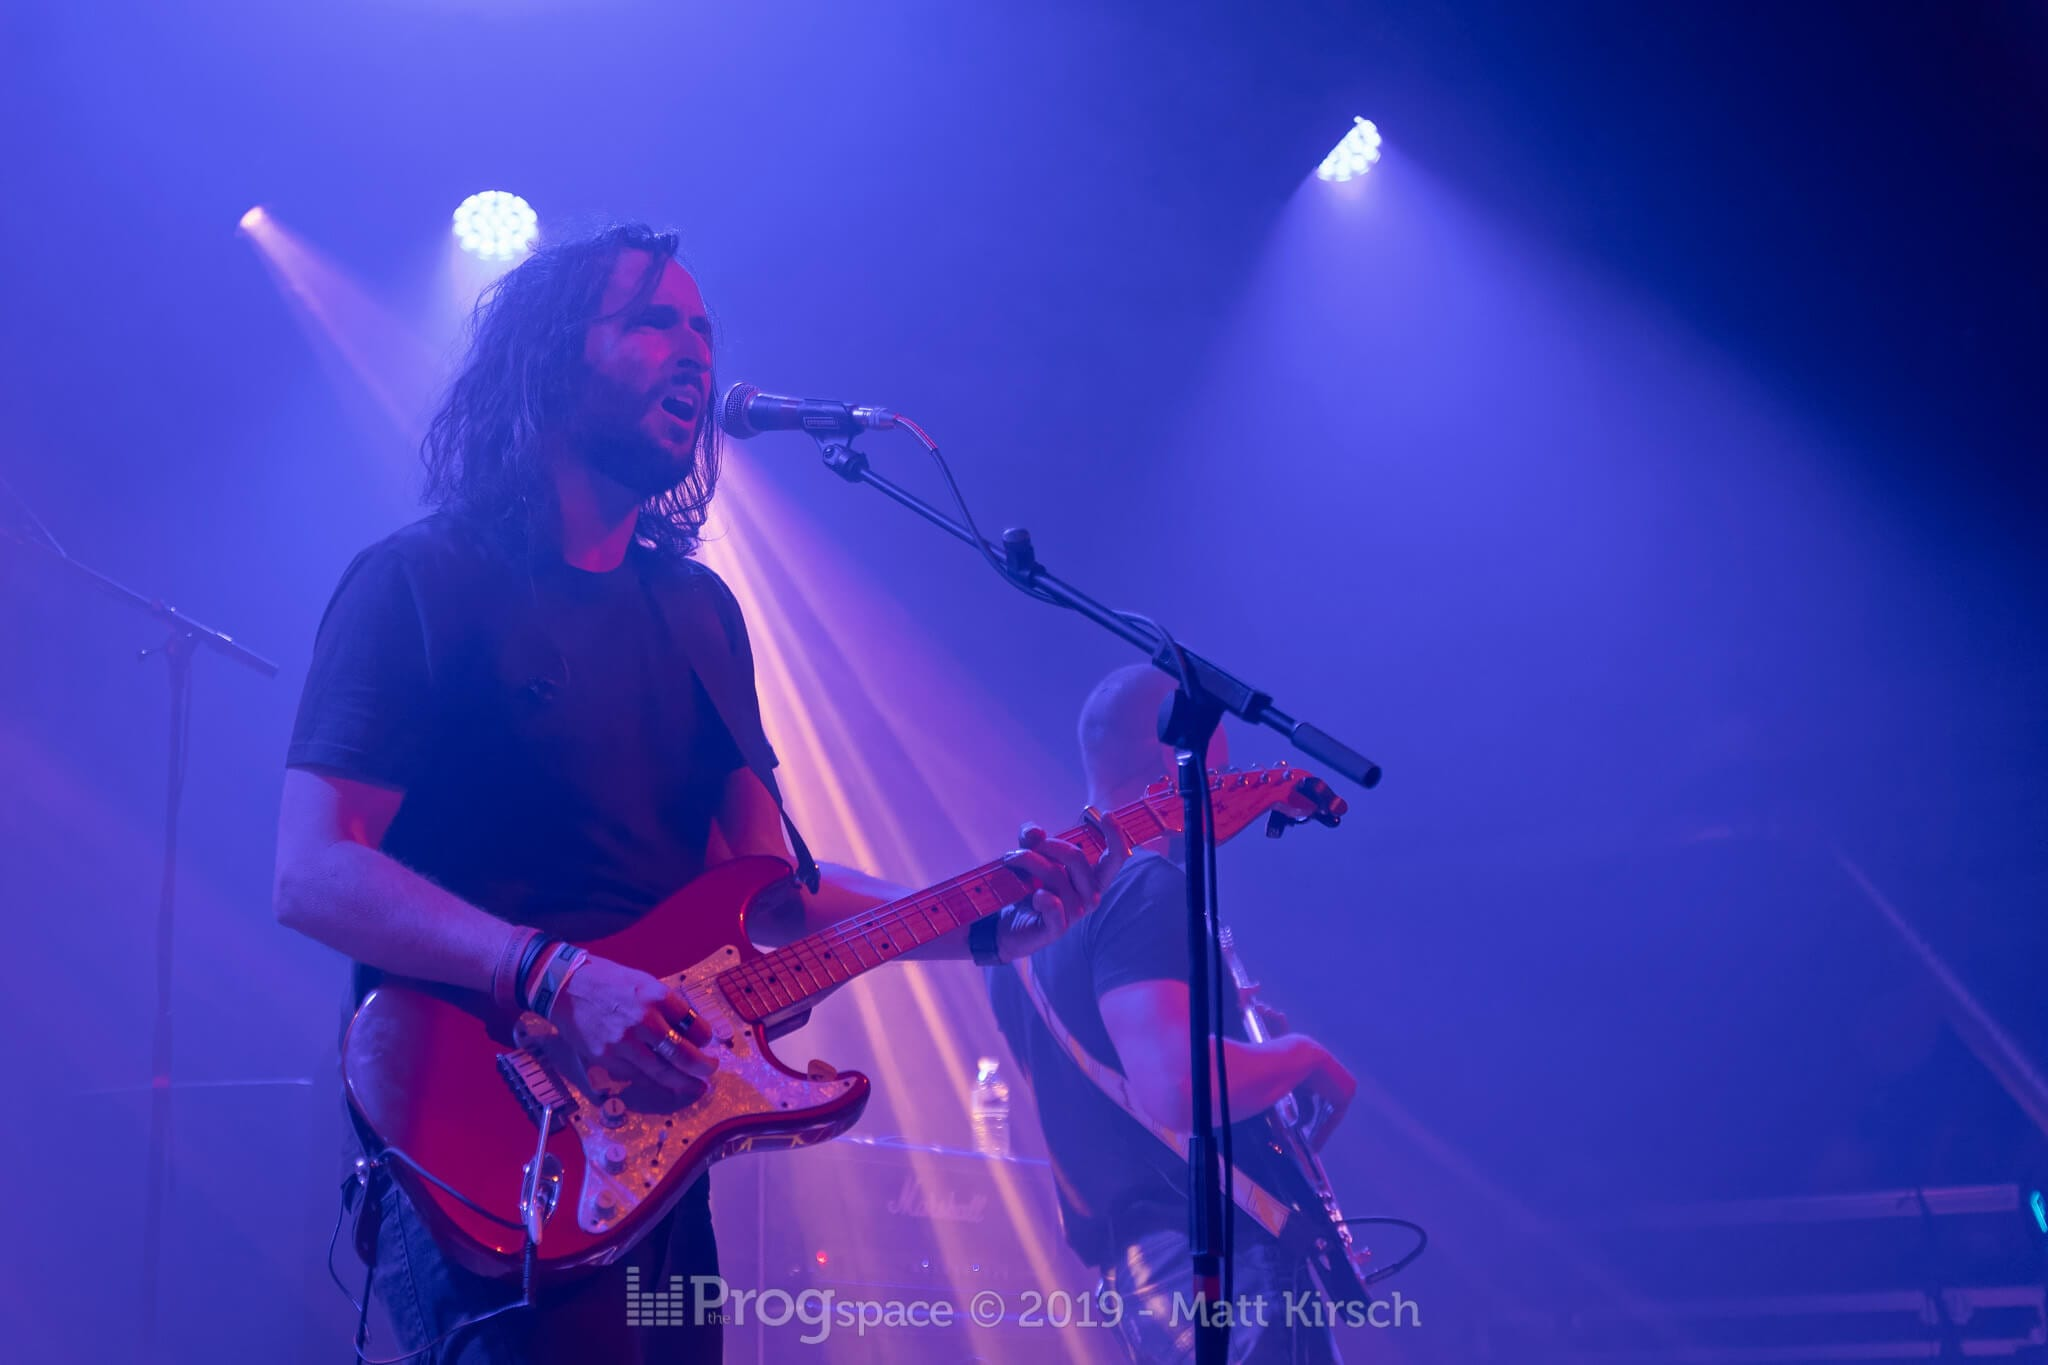 Nosound live at Prognosis Festival